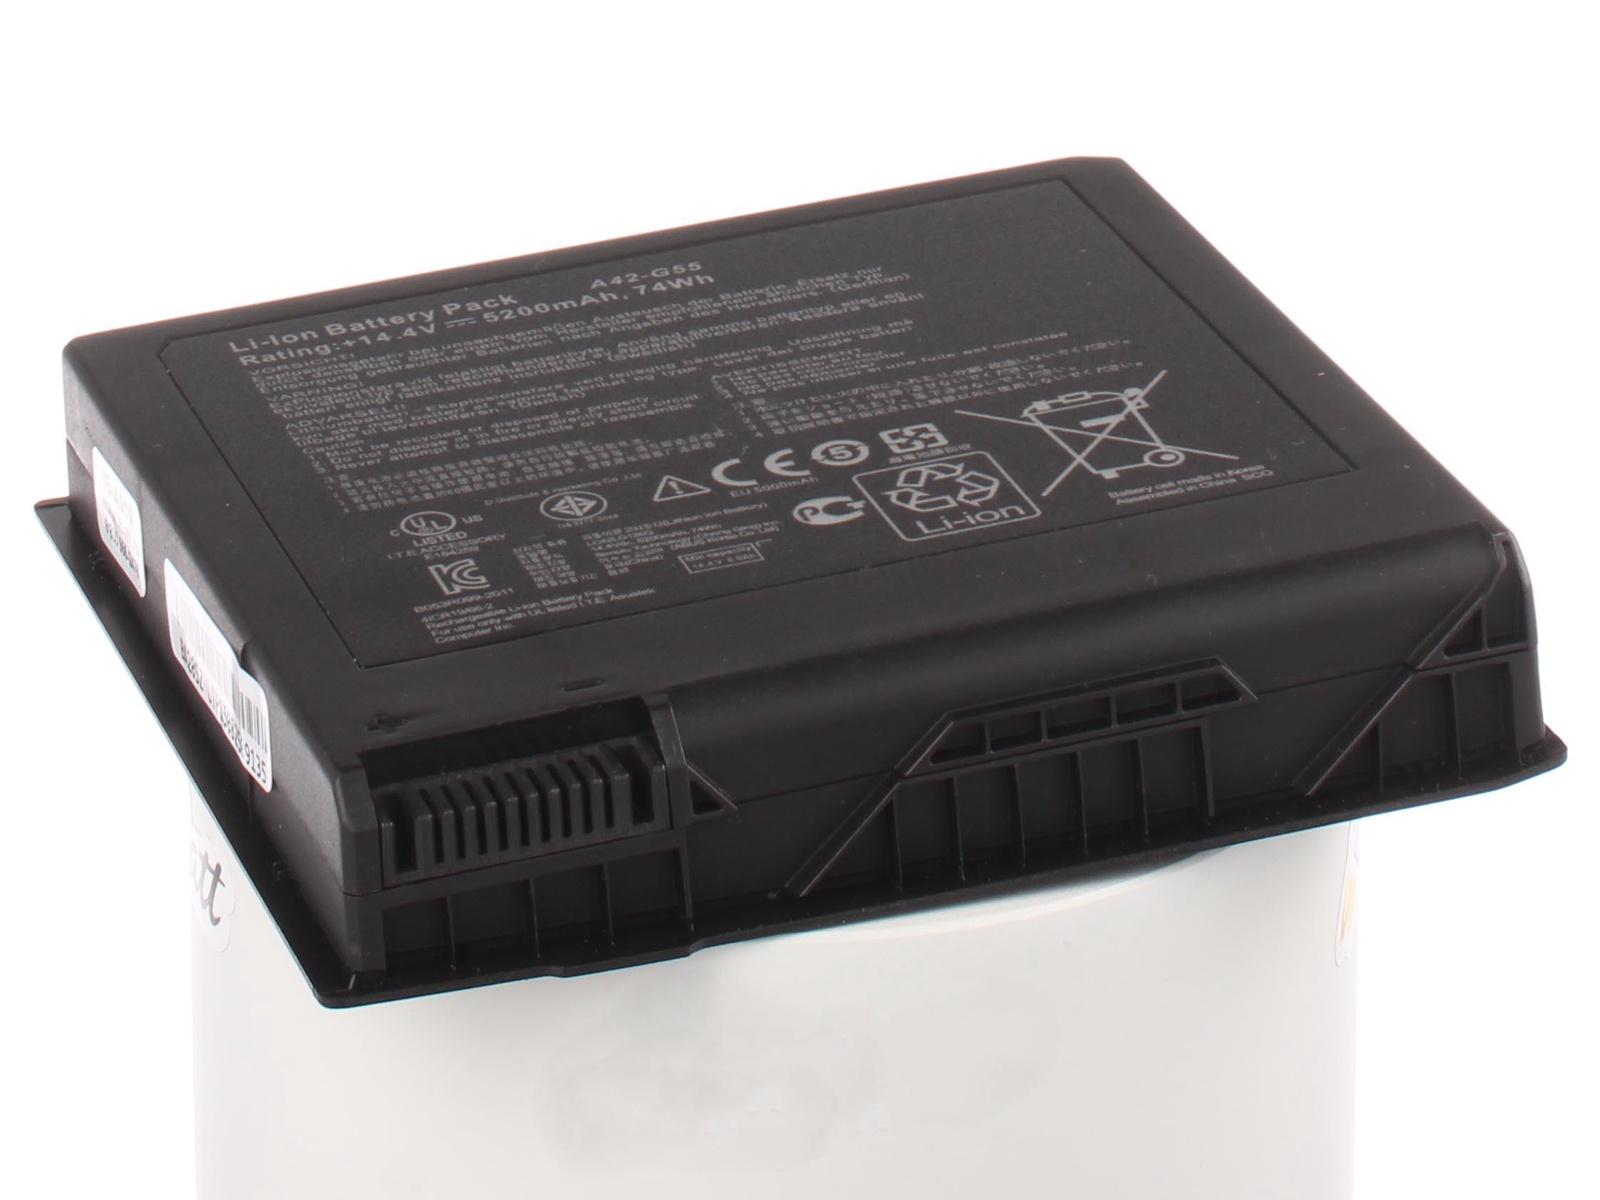 цена на Аккумулятор для ноутбука iBatt для Asus ROG G551JW, G771JM, ROG G551JM, N751JK T4208H, GL551JW, ROG G551J, N751JX-T7215T, N551JX, ROG GL551JW, ROG G771, GL551J, GL551JM, GL771, ROG G551JK, ROG G551, N551JQ, N551JV, ROG G771JM